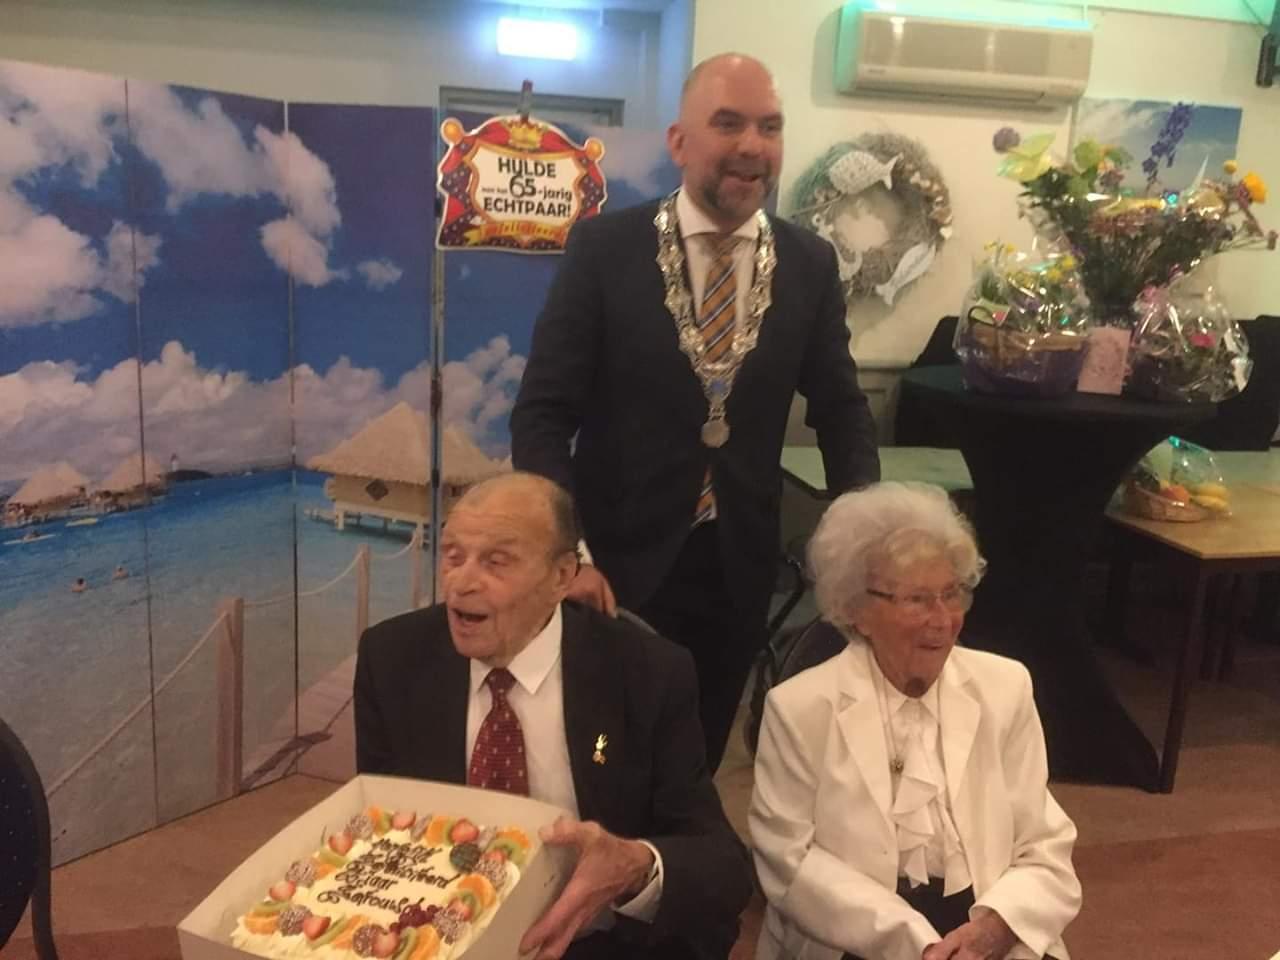 Echtpaar Bosschert 65 jaar getrouwd